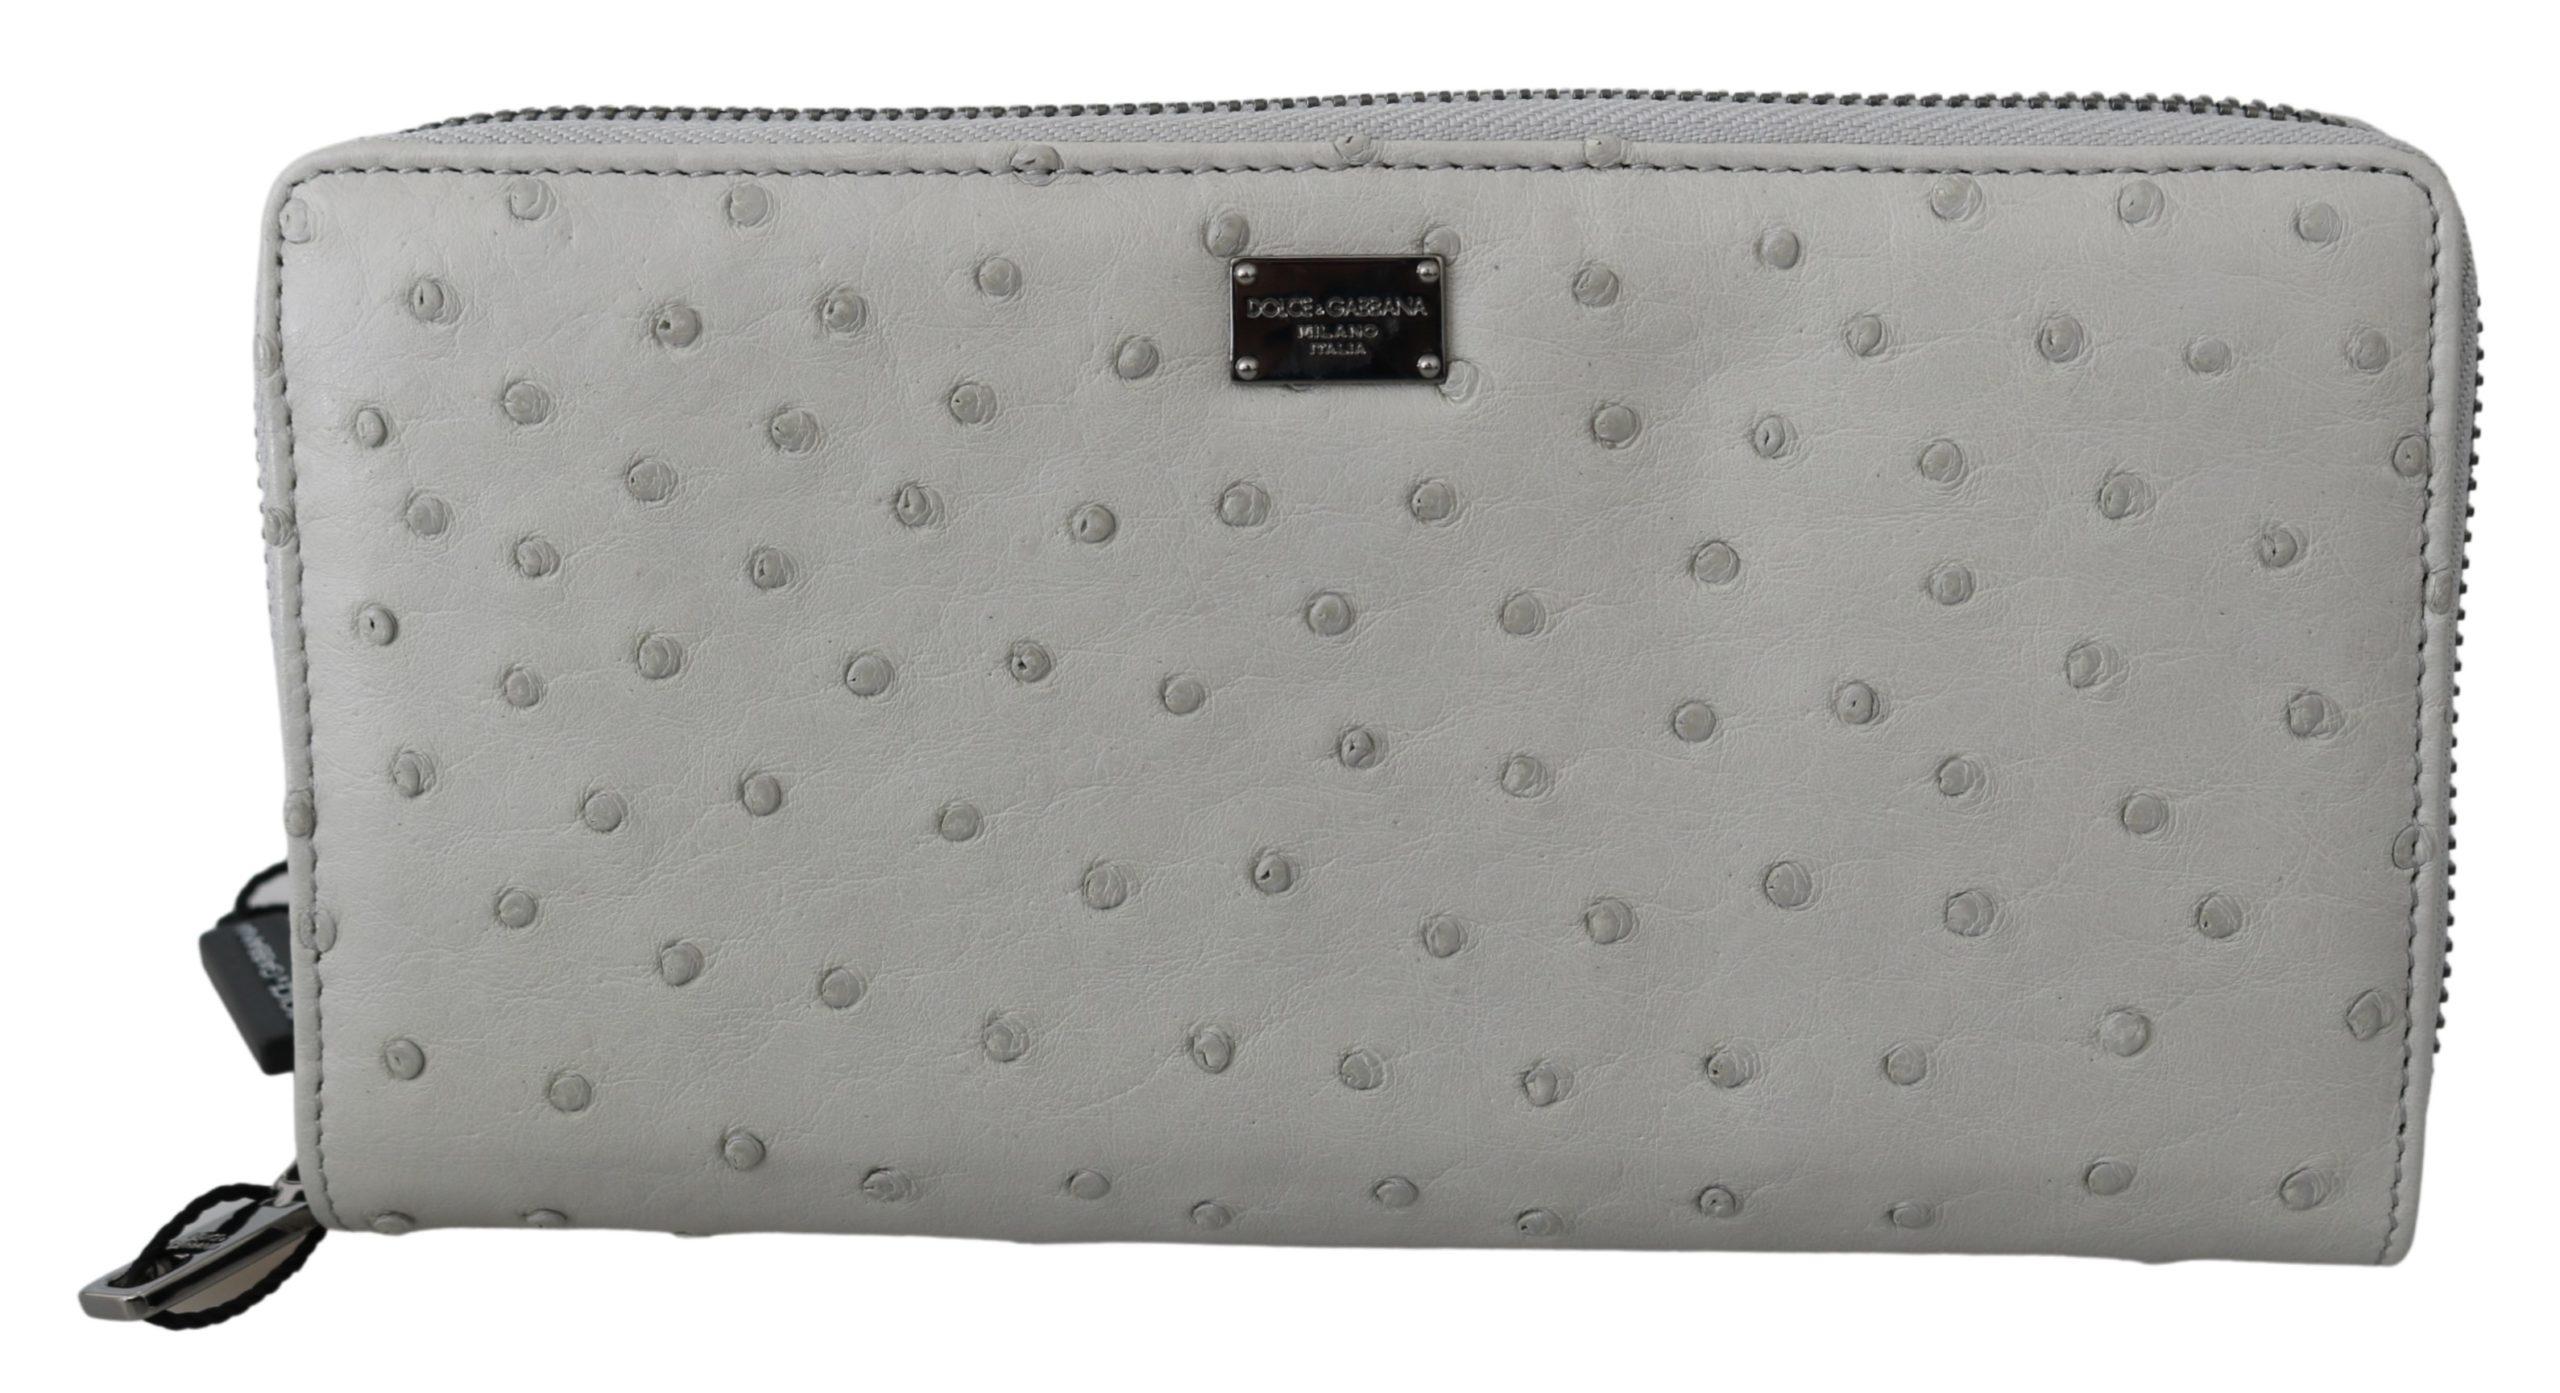 Dolce & Gabbana Men's Ostrich Leather Continental Wallet Gray VAS9702